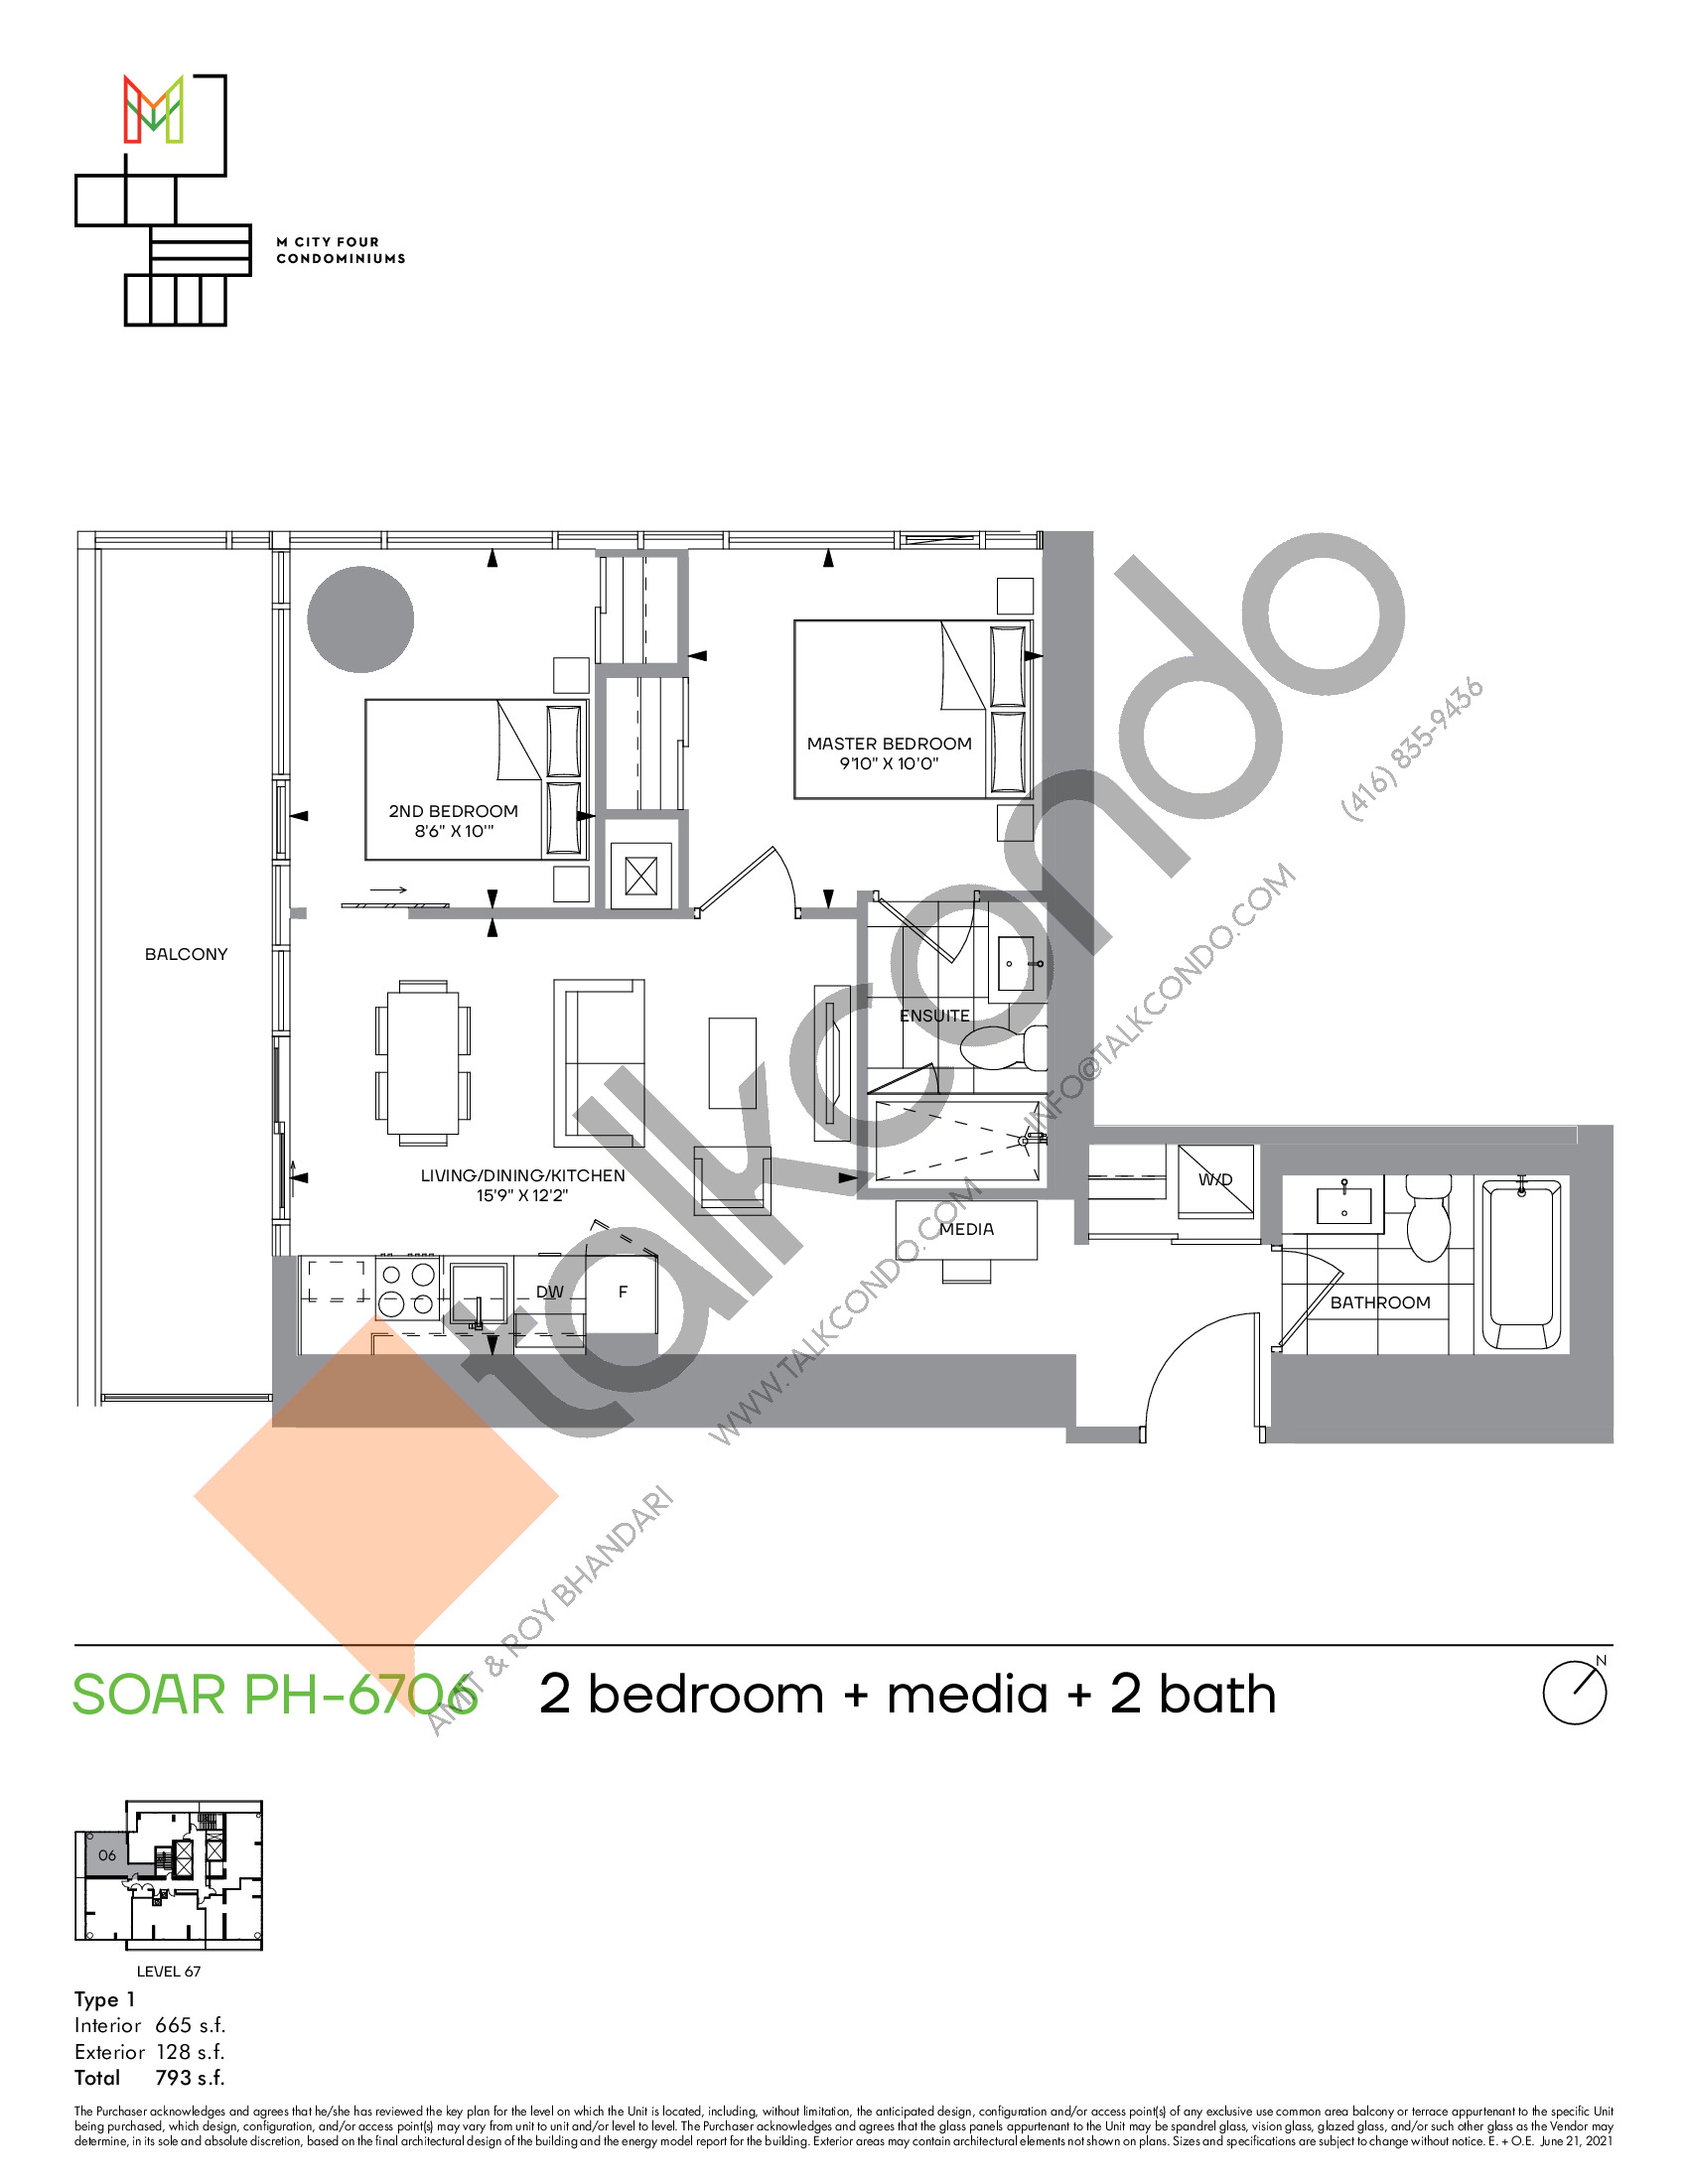 Soar PH-6706 Floor Plan at M4 Condos - 665 sq.ft